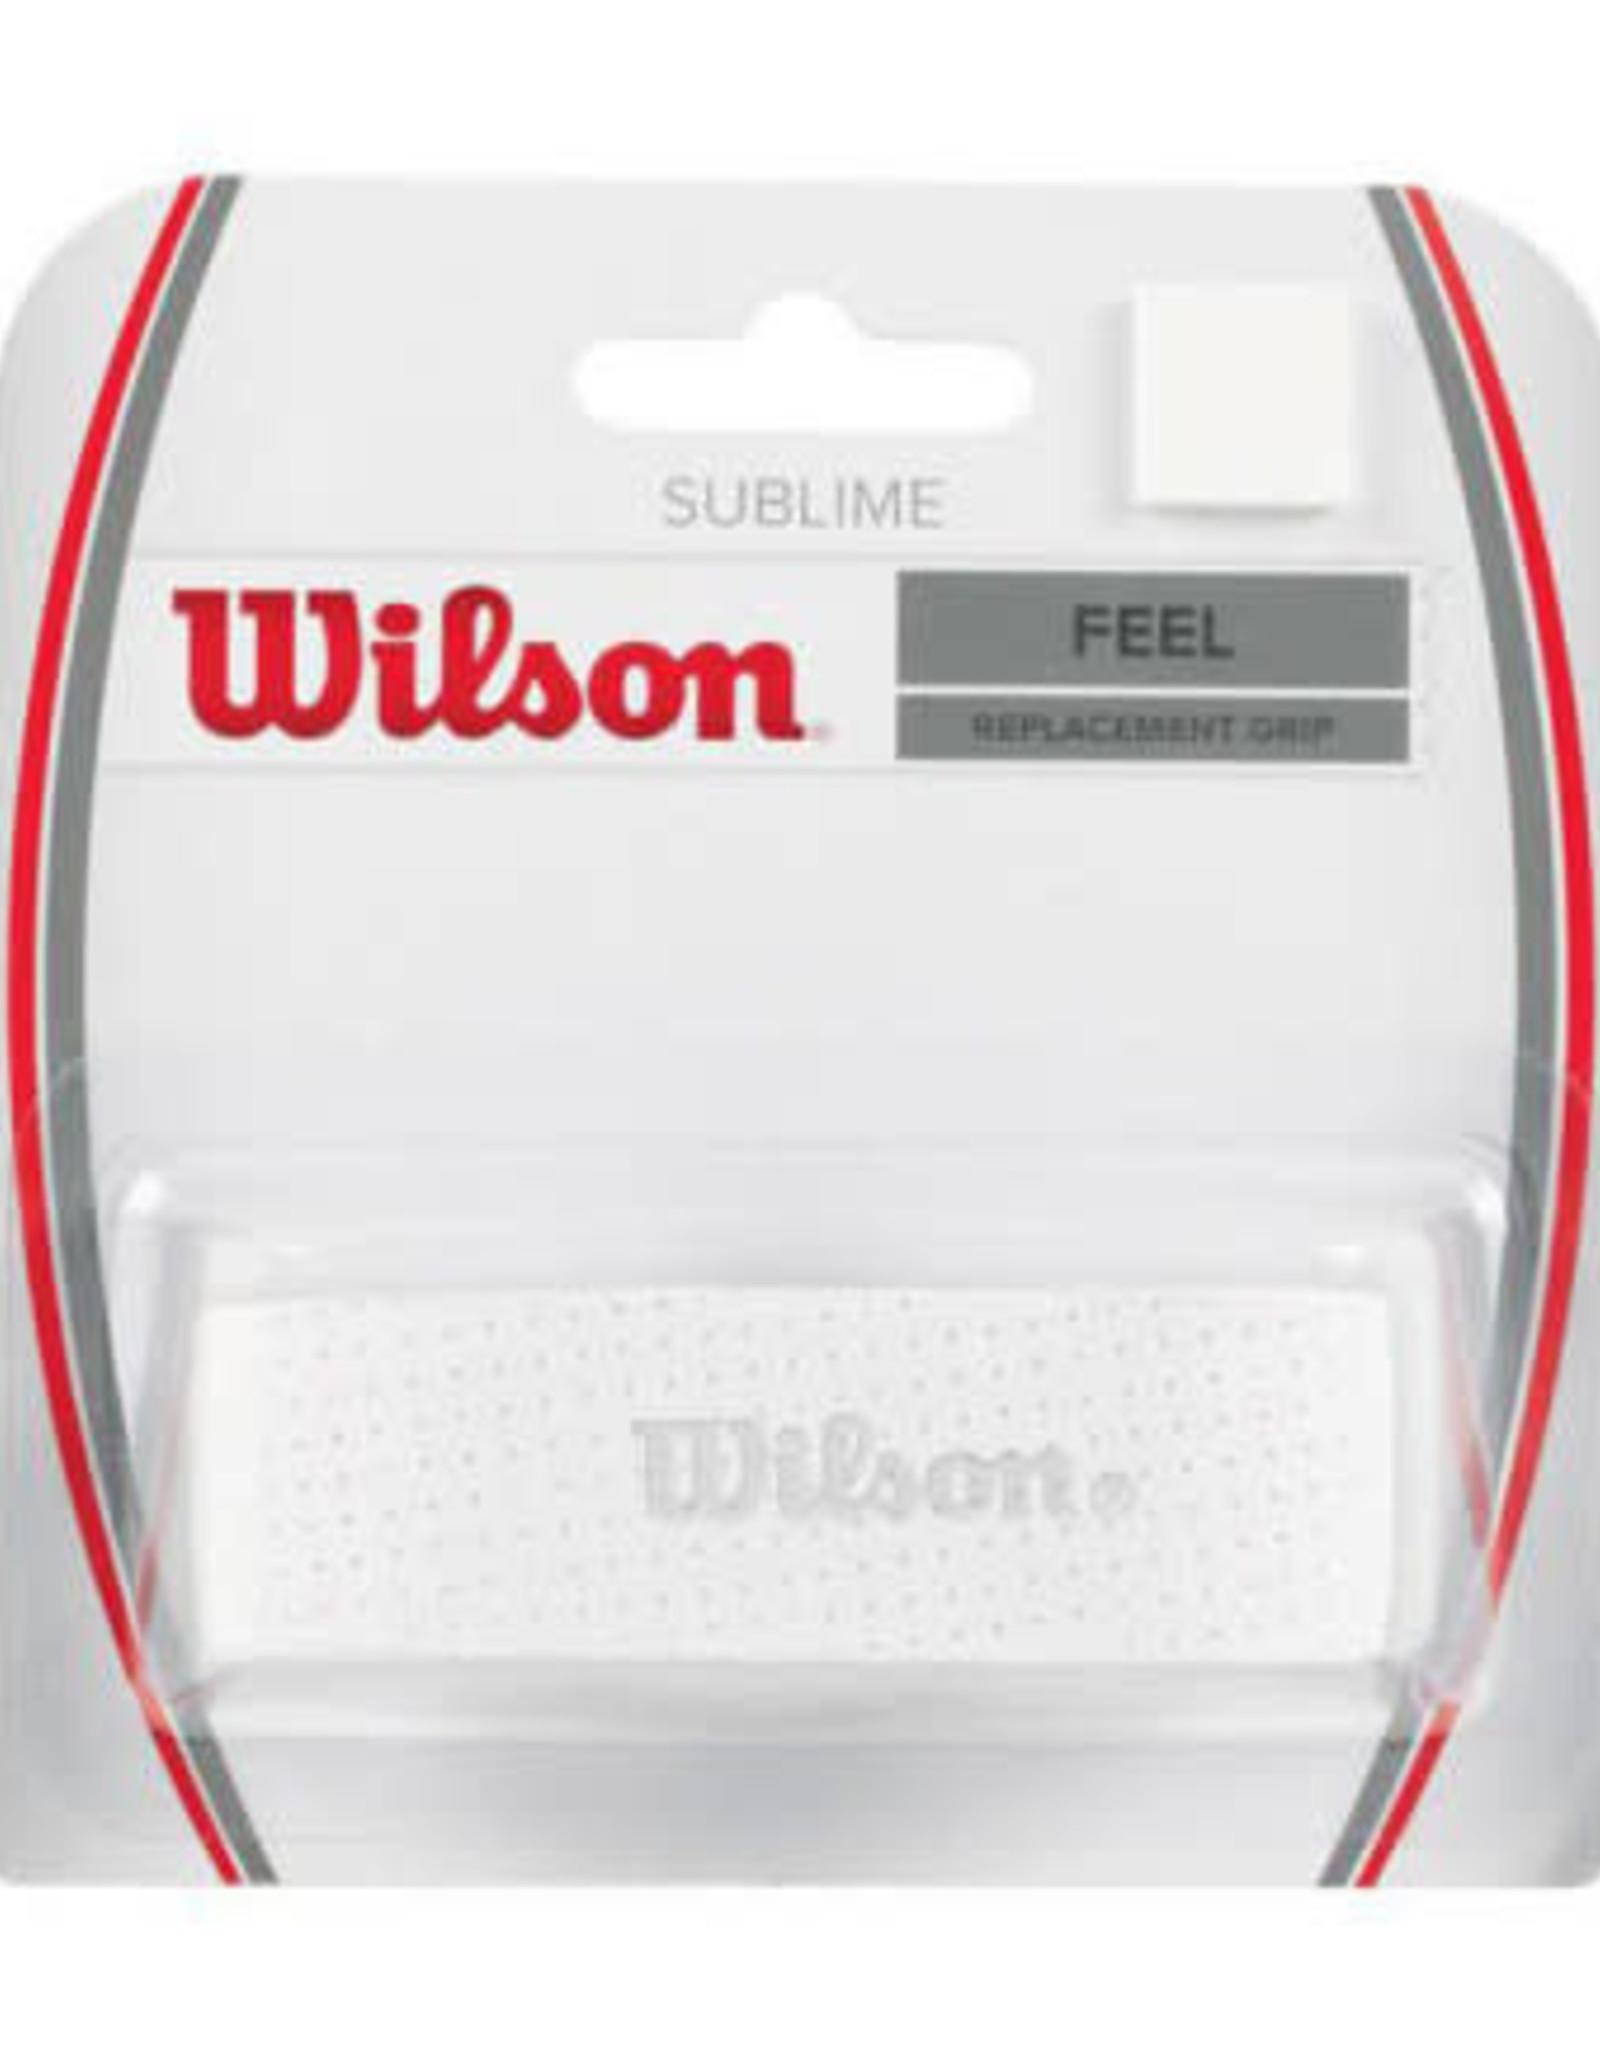 Wilson Grip Feel sublime  blanc